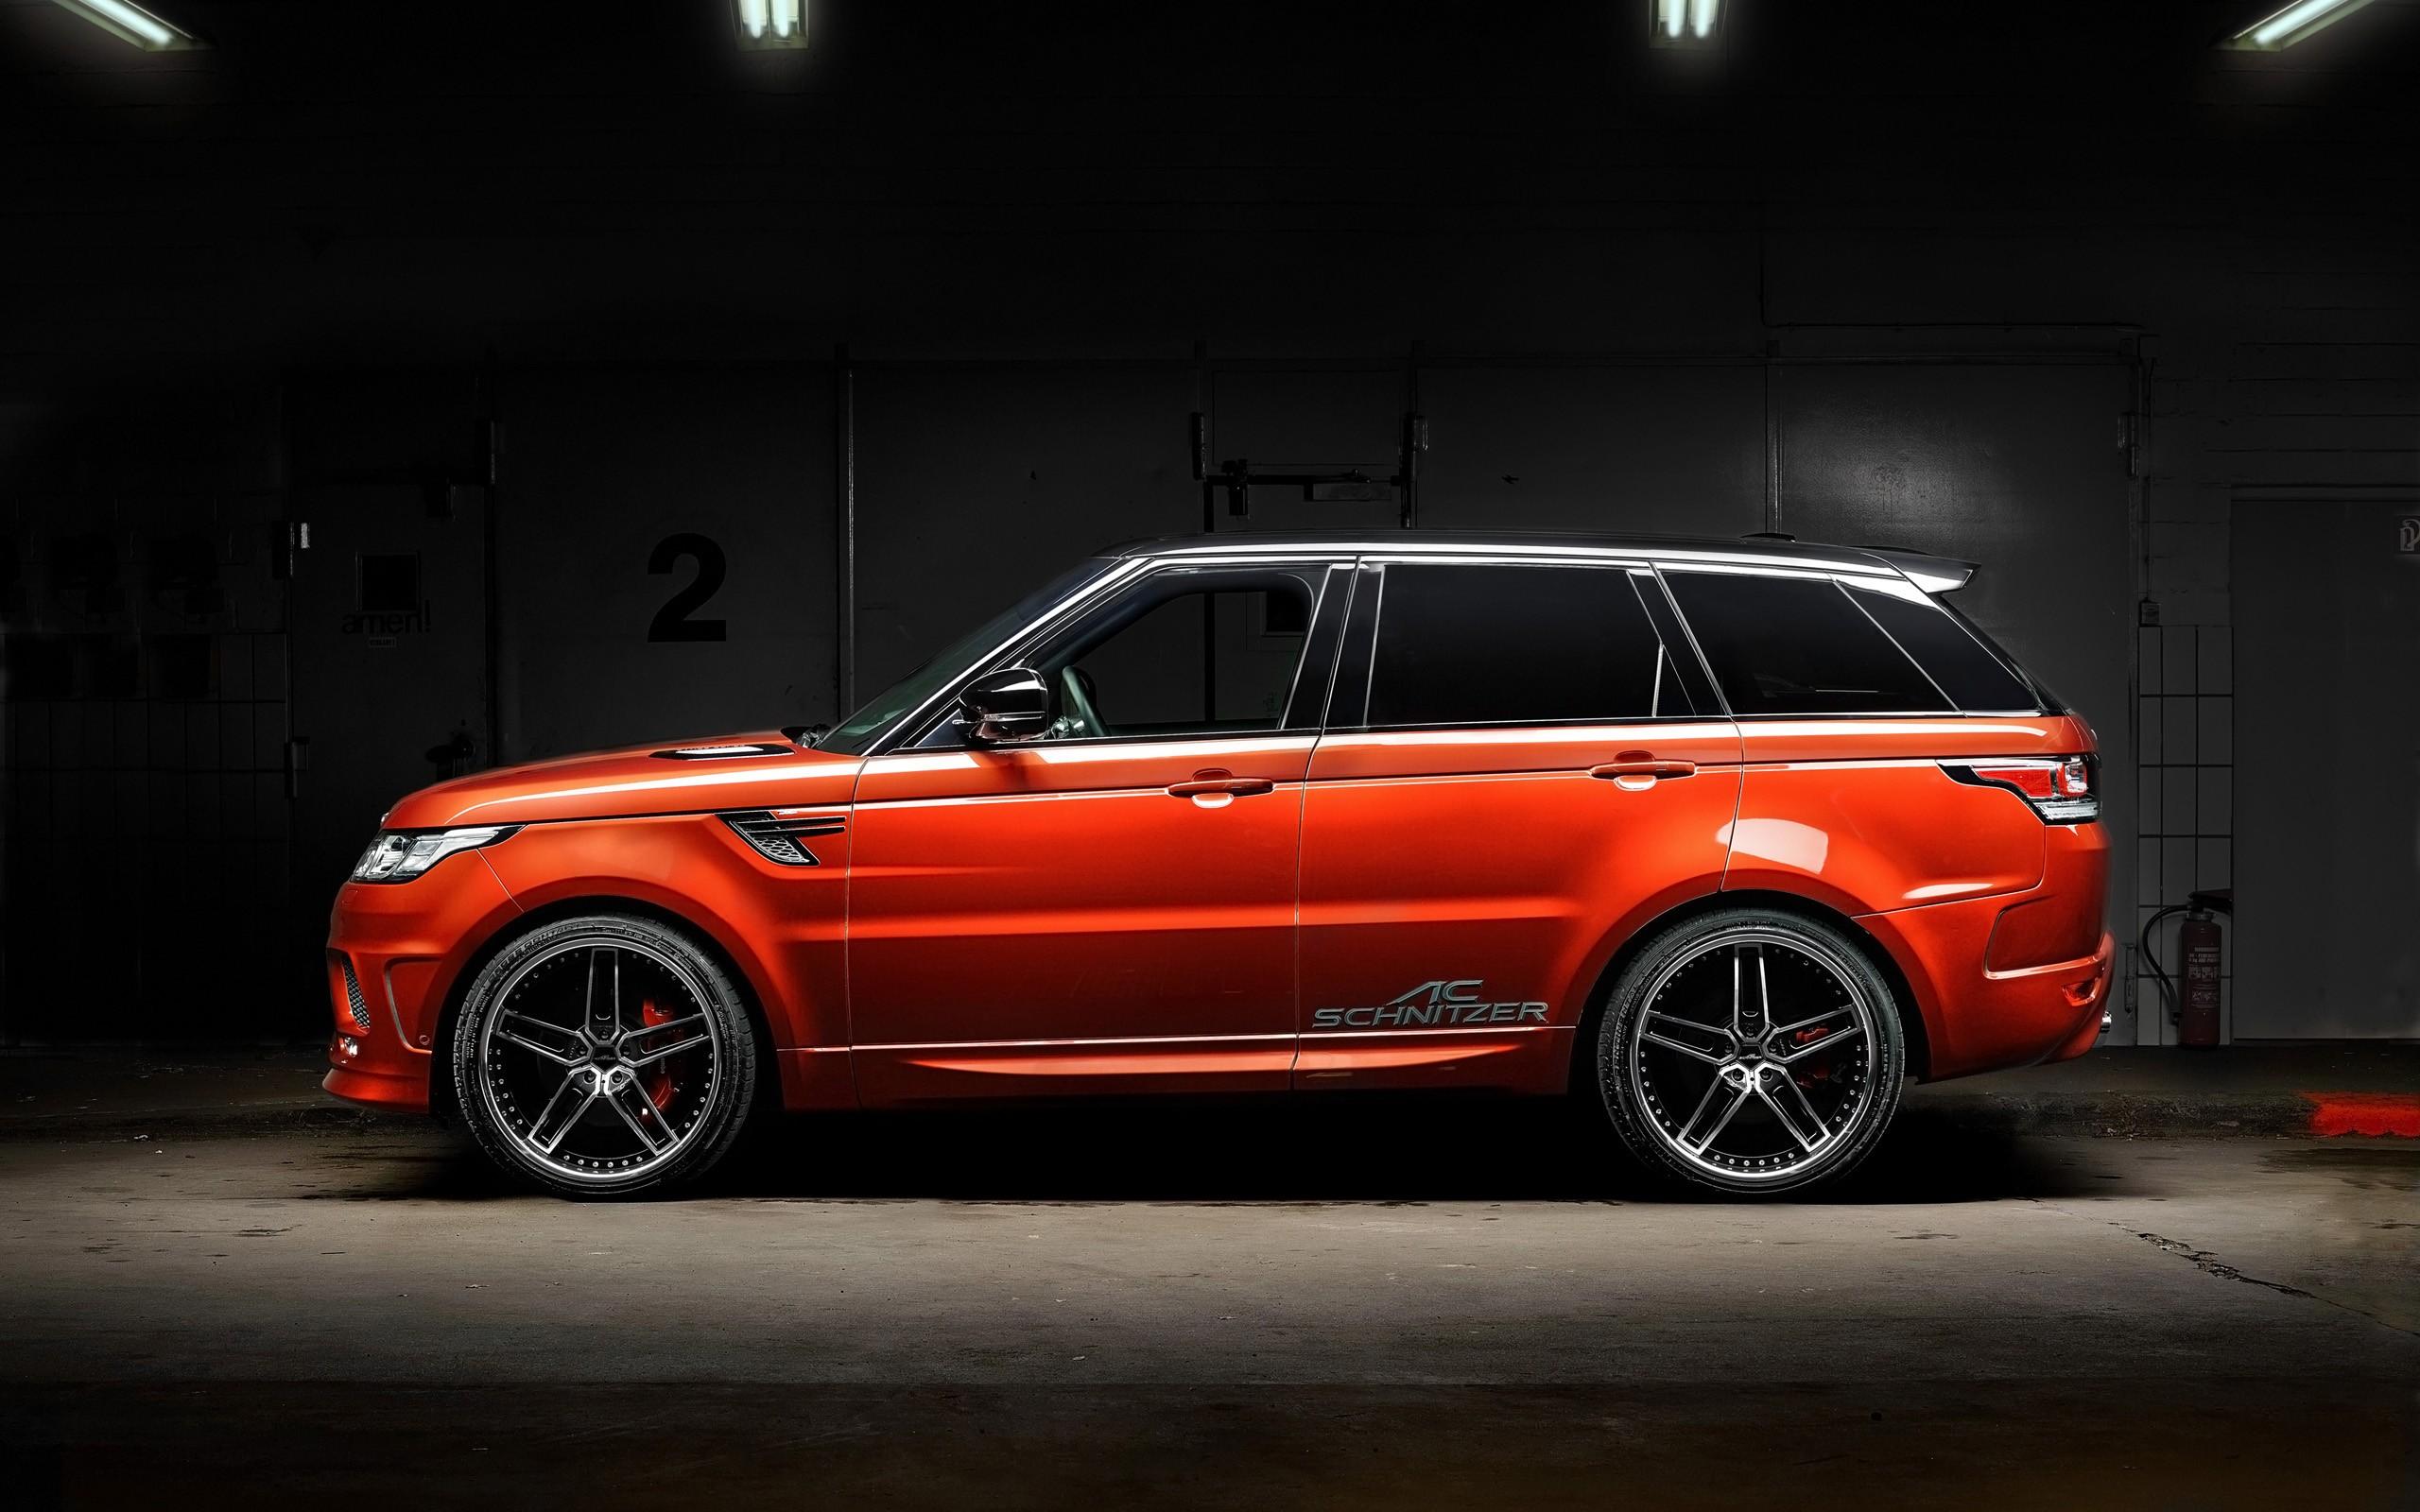 2014 Range Rover Sport By AC Schnitzer Wallpaper HD Car